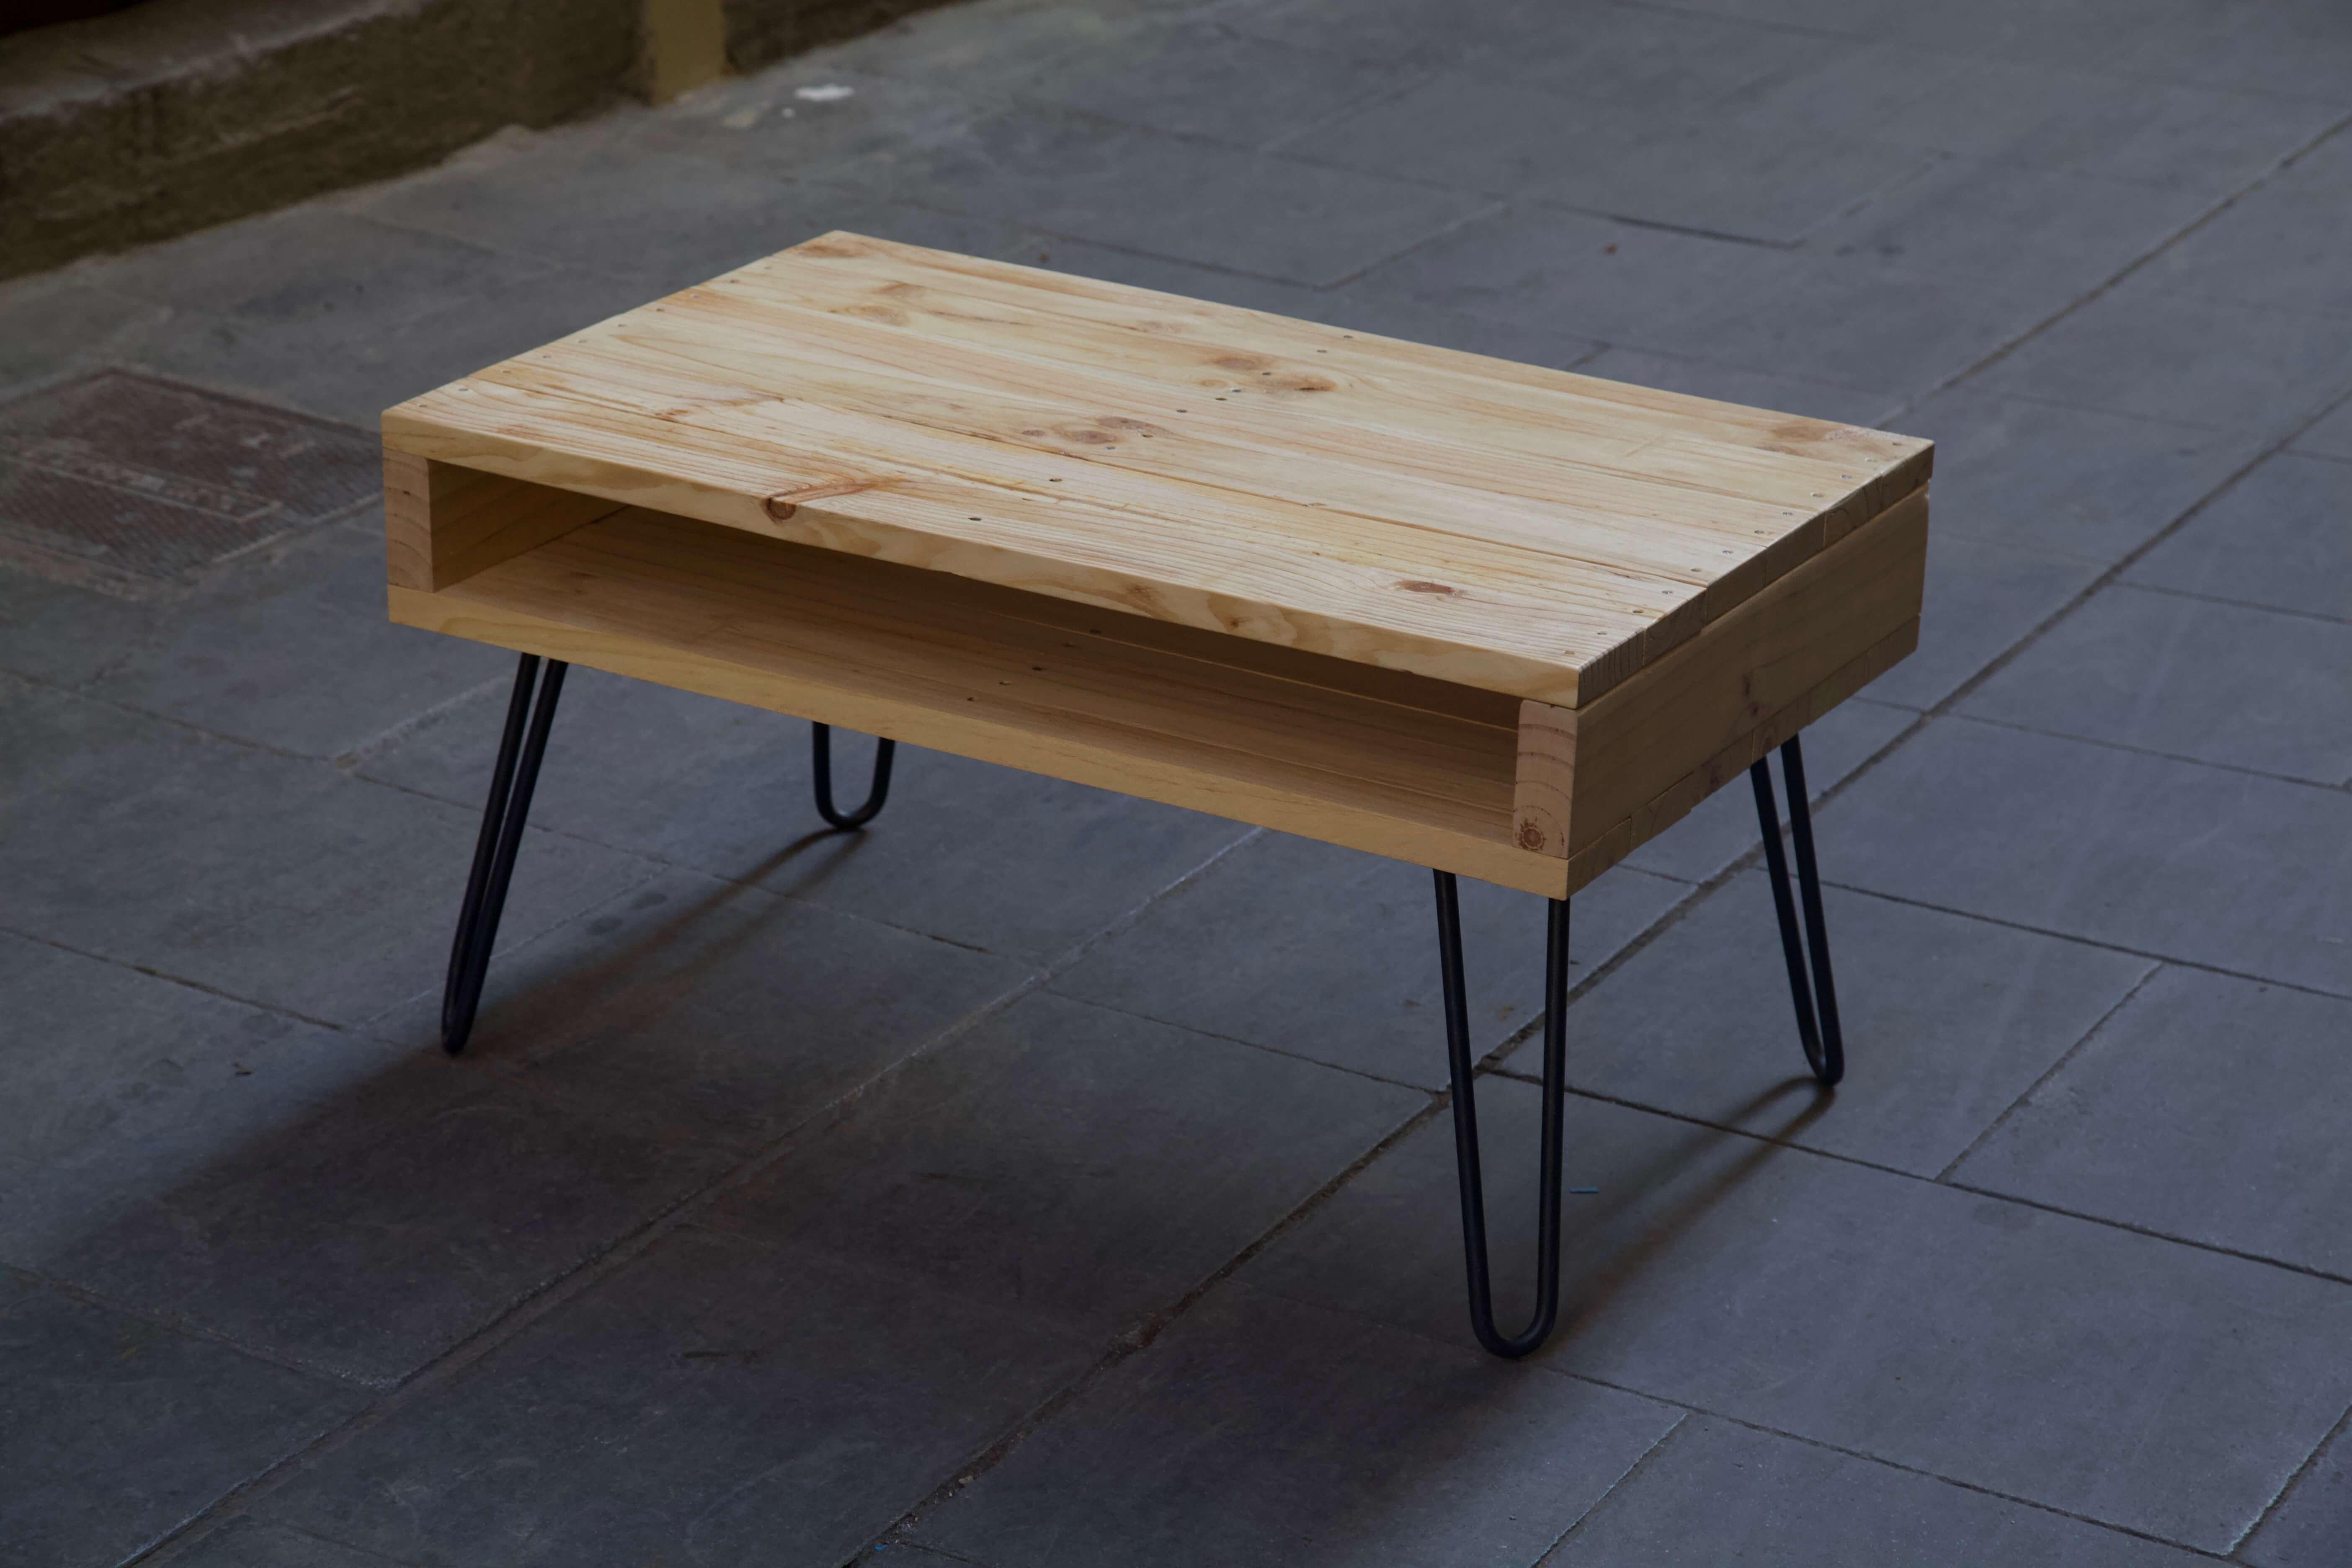 detalle superior derecha de la mesa hecha con palets lexa